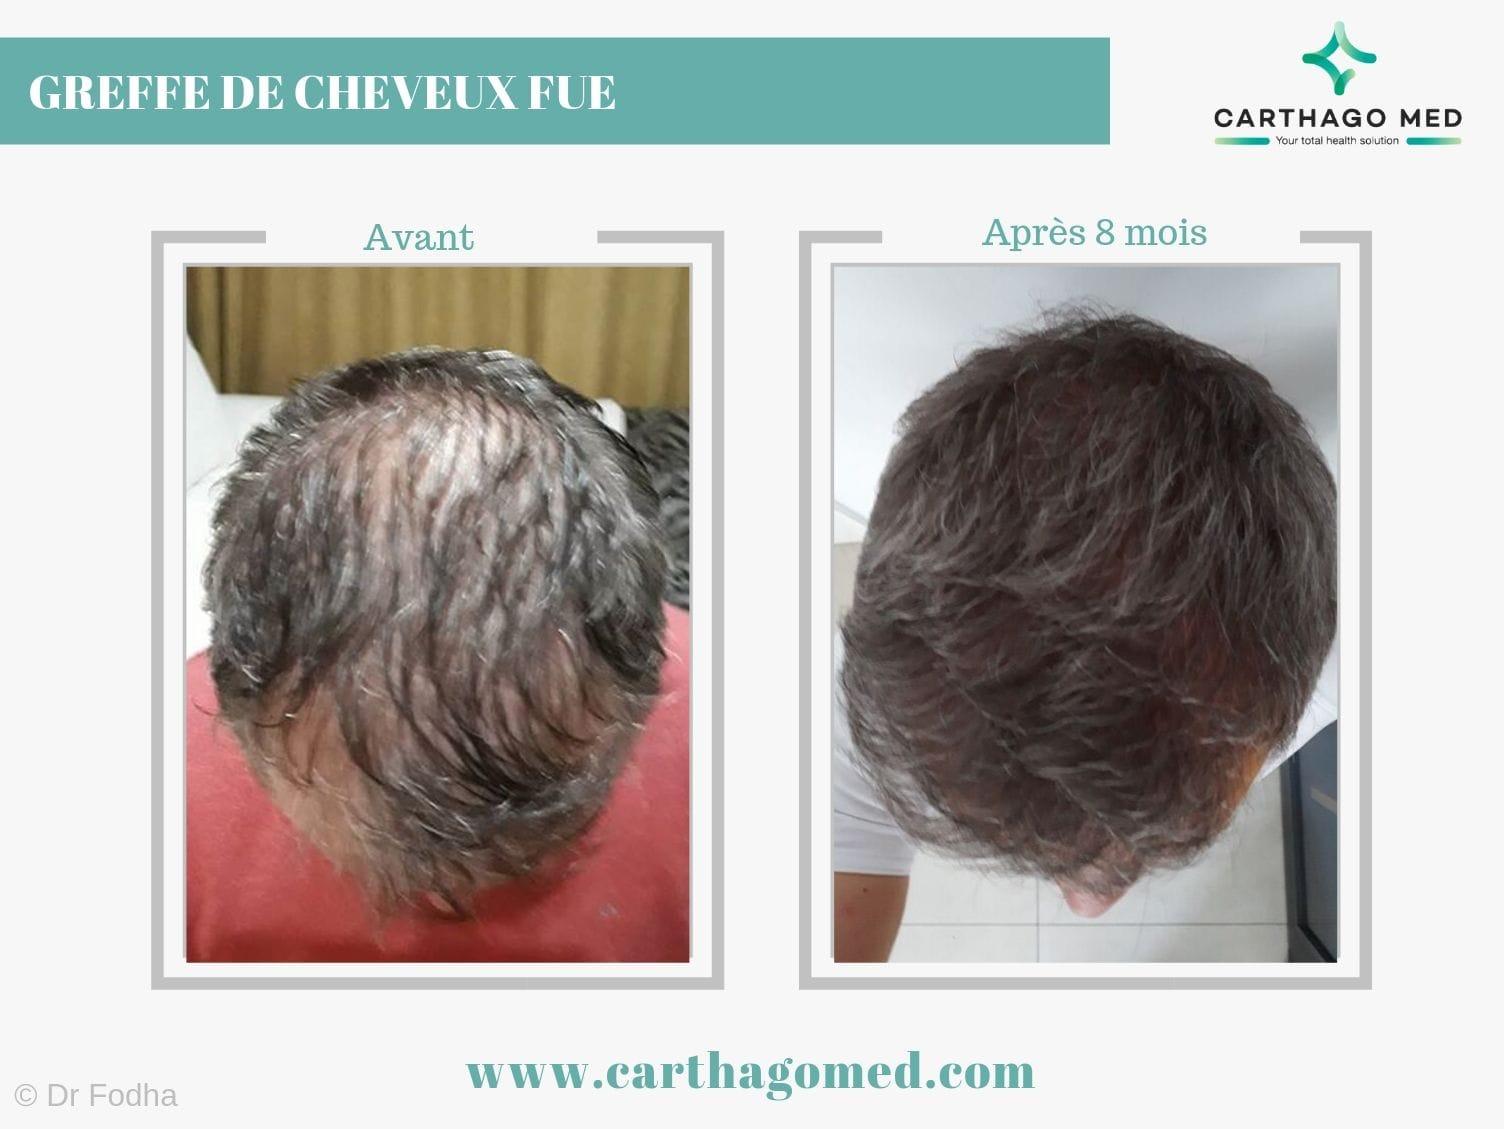 Greffe de cheveux carthago med (2)